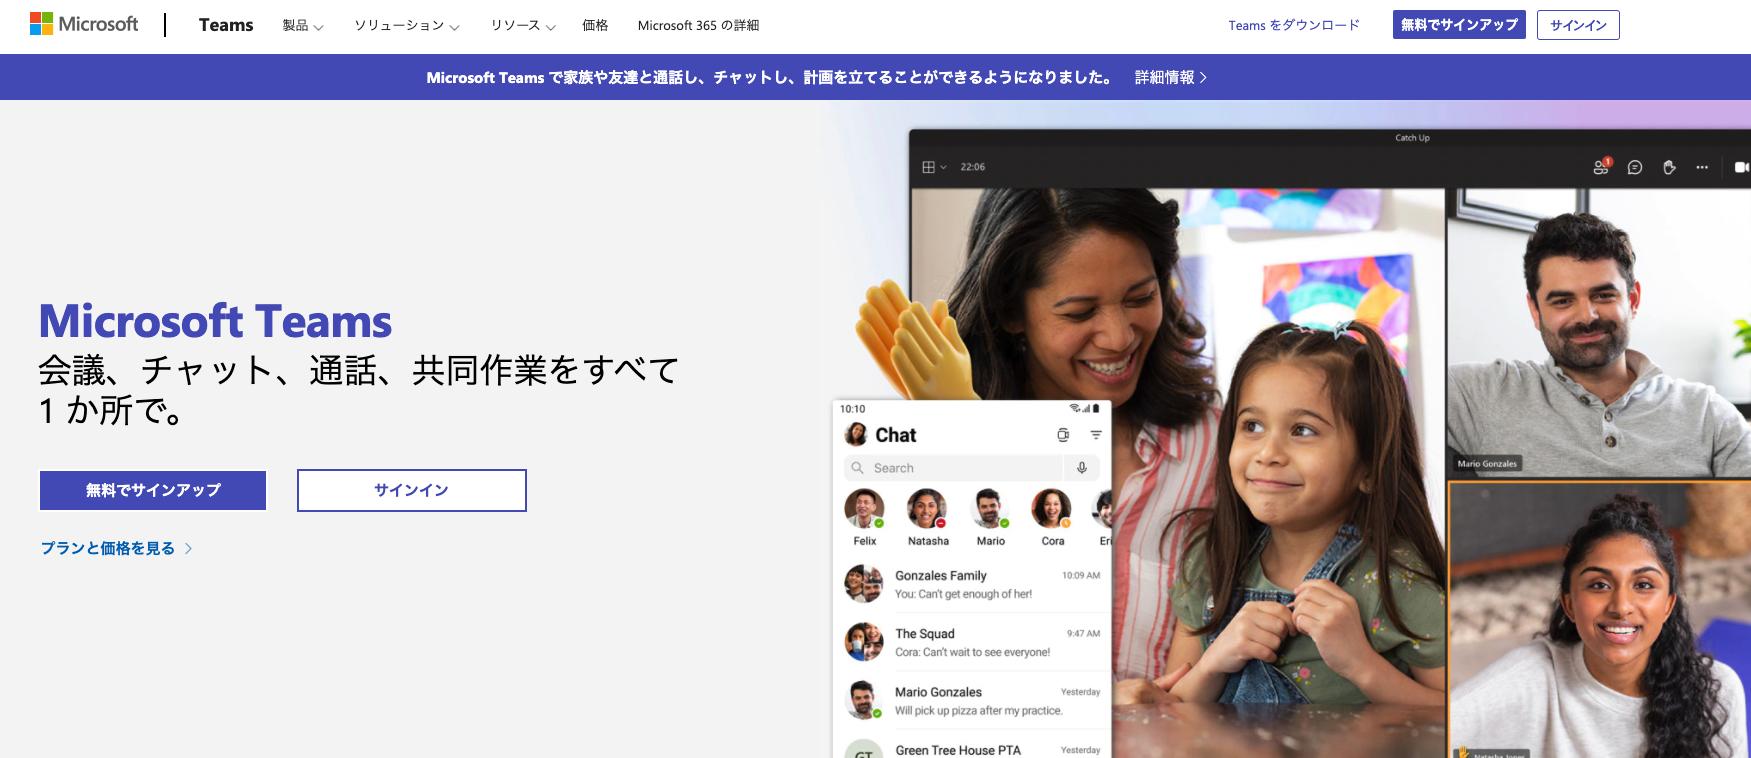 Microsoft Teamsトップ画像